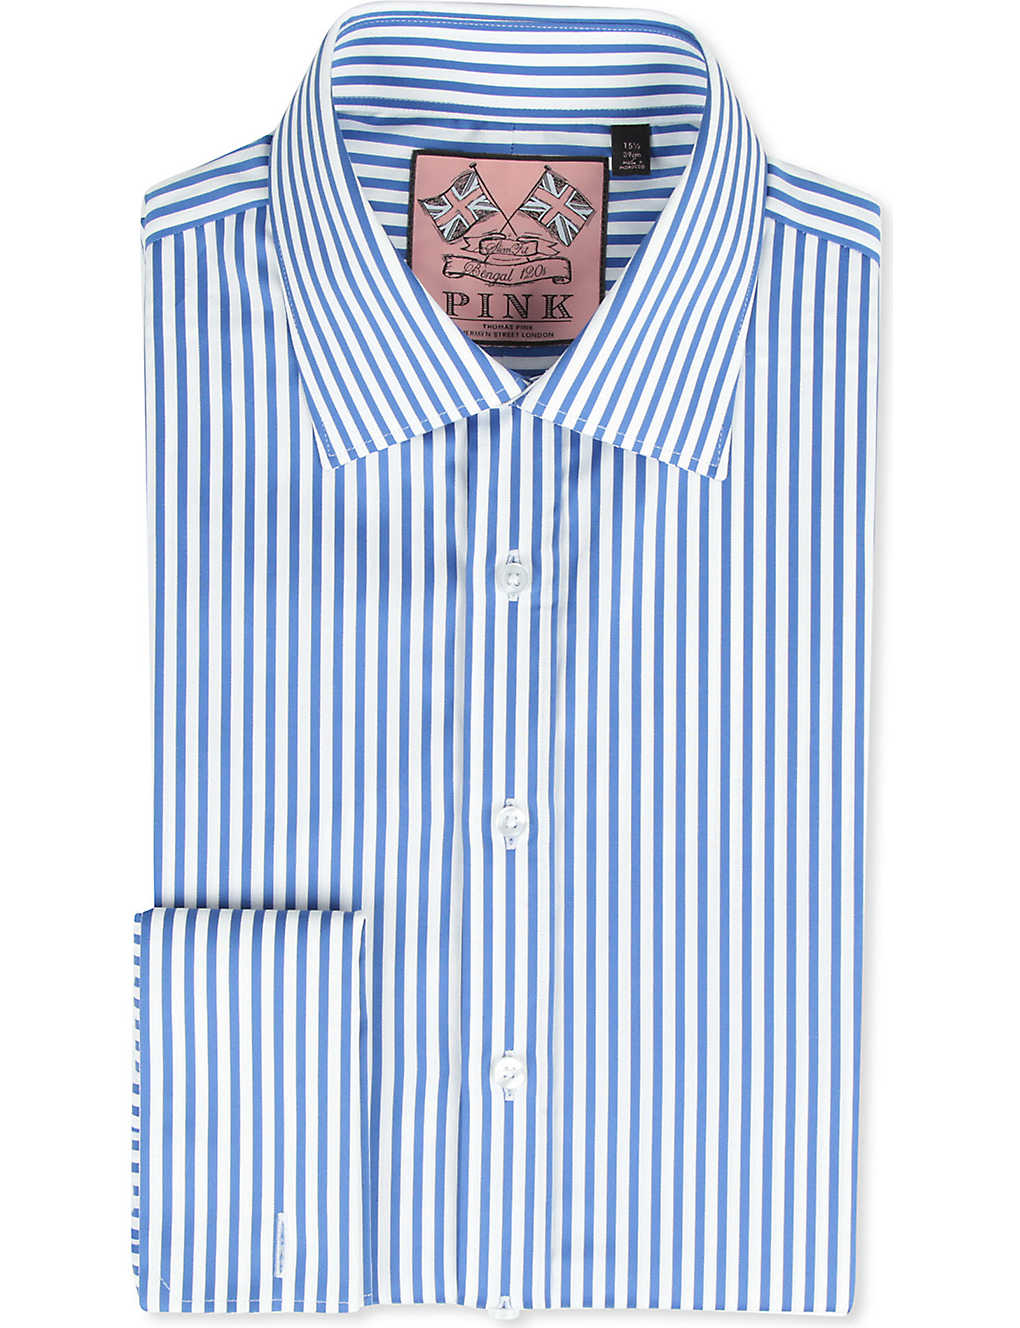 9b15a47f THOMAS PINK - Algernon slim-fit double-cuff shirt | Selfridges.com